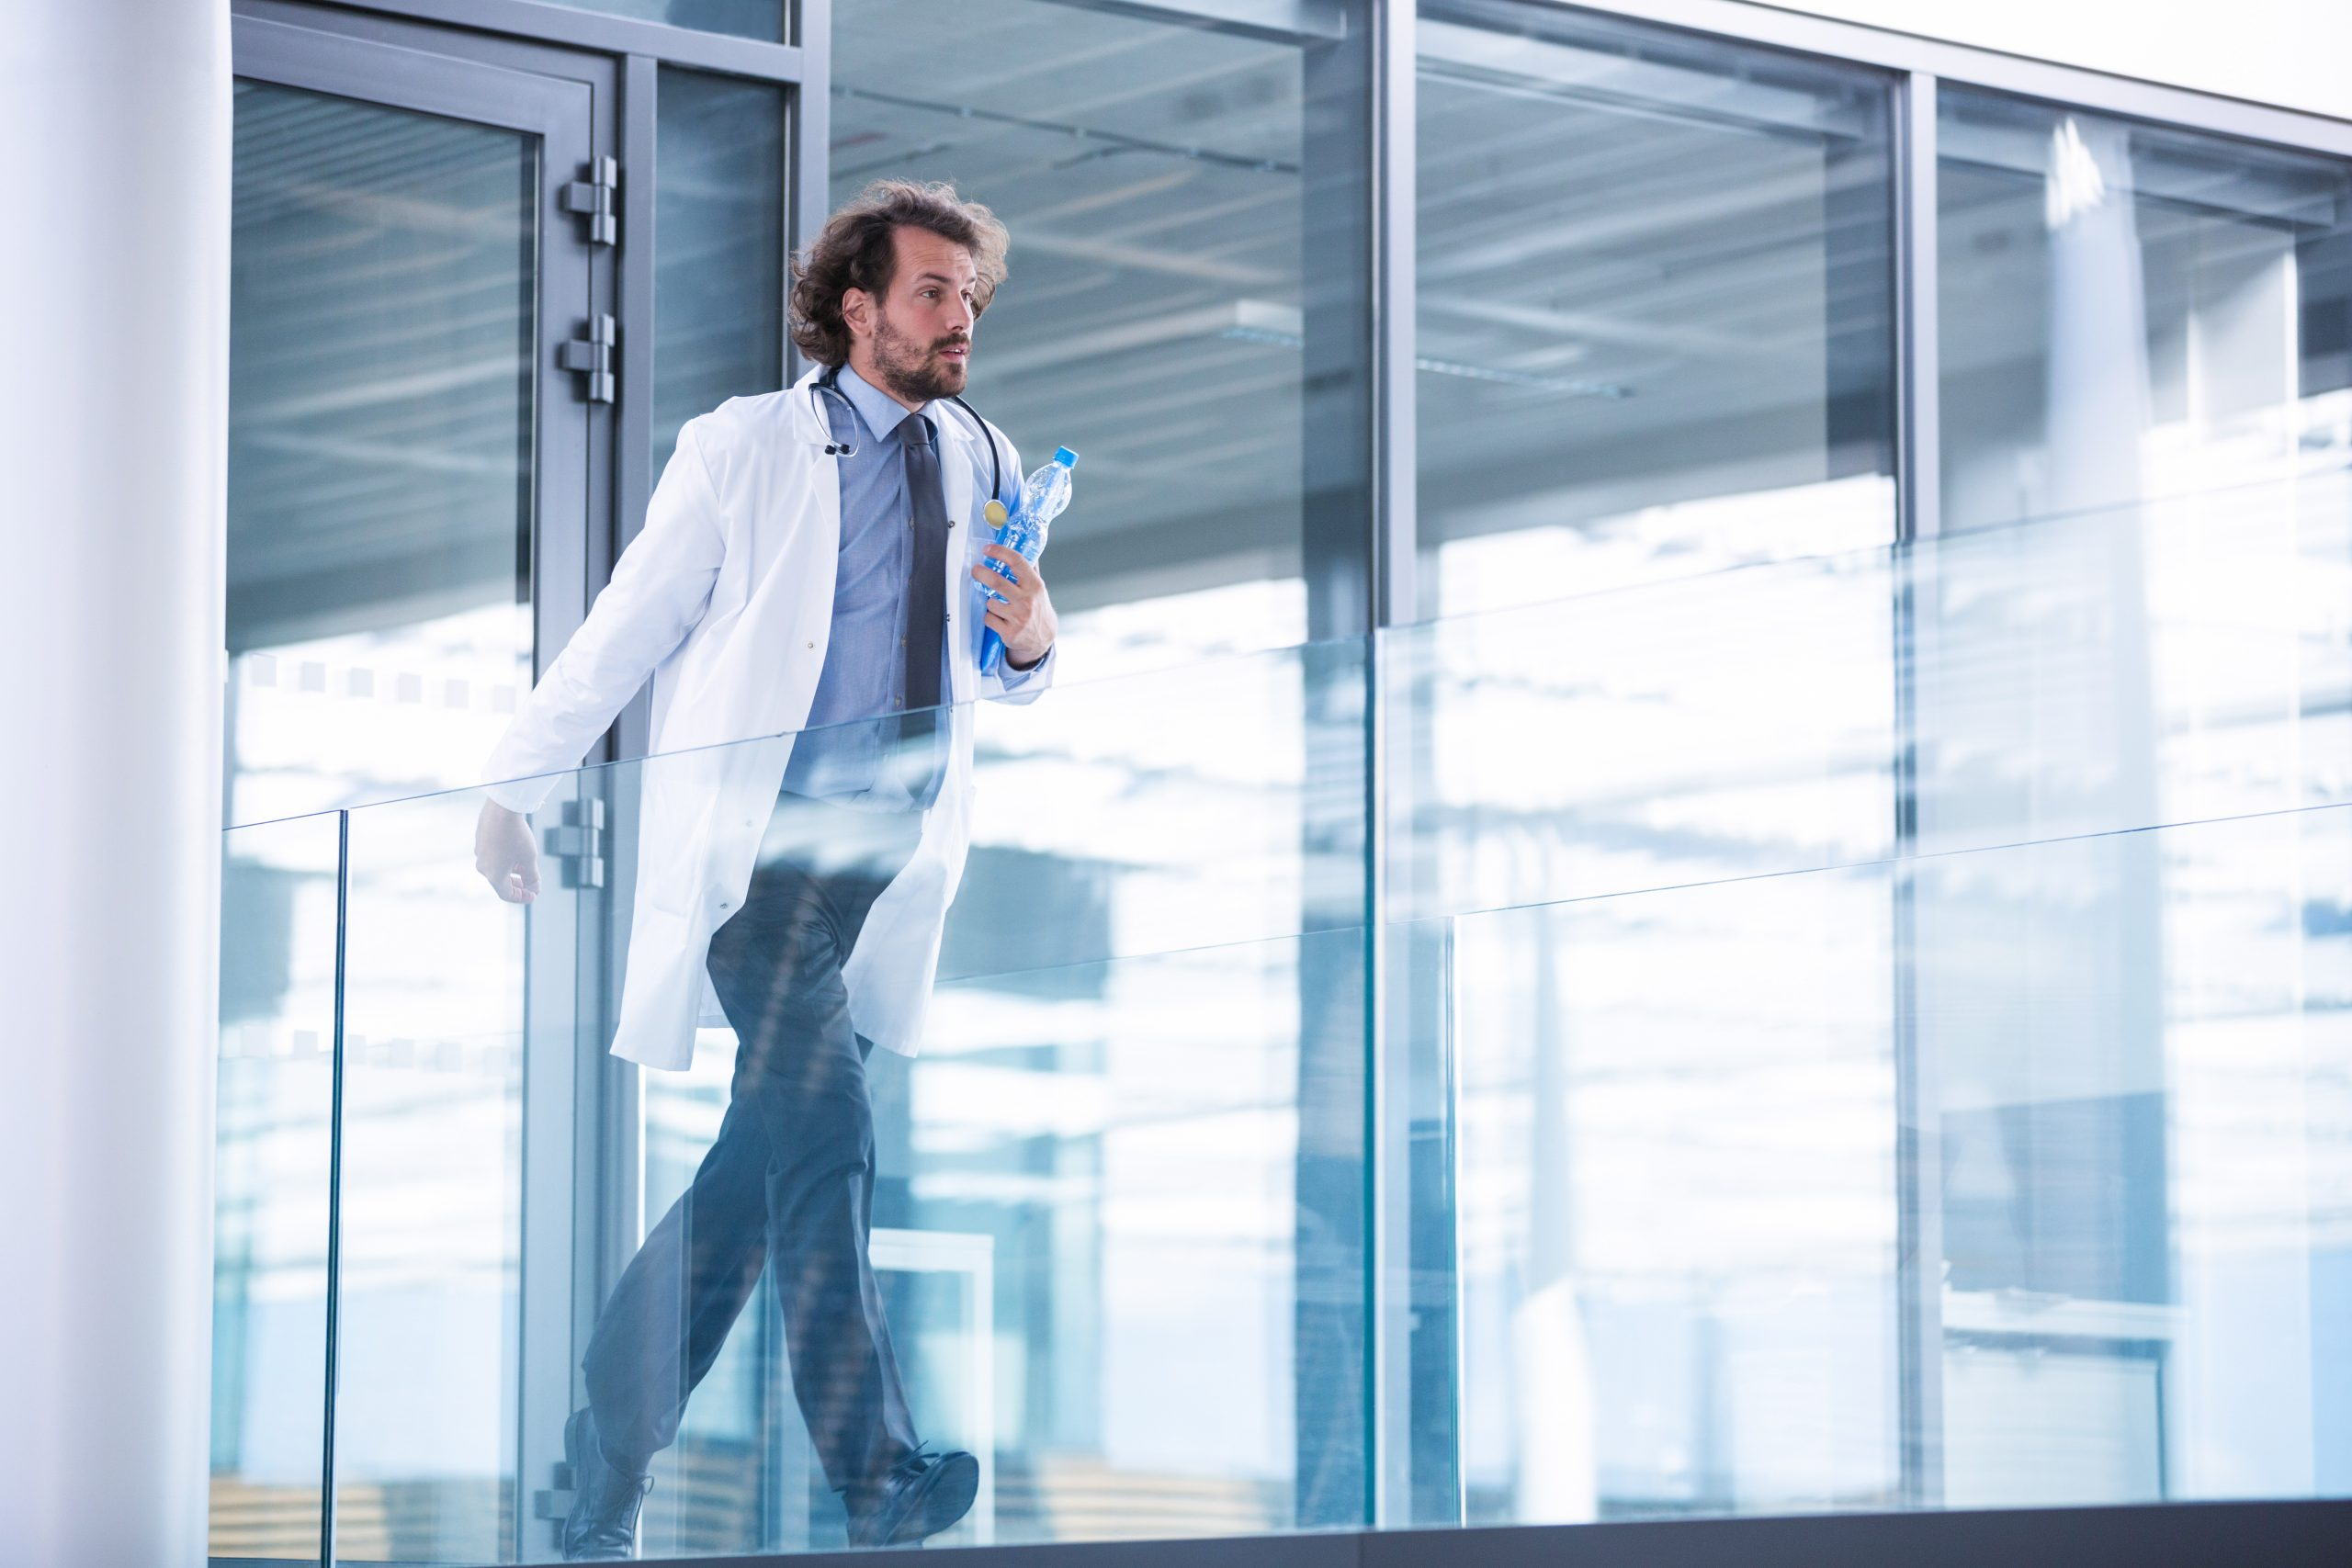 Doctor rushing in corridor